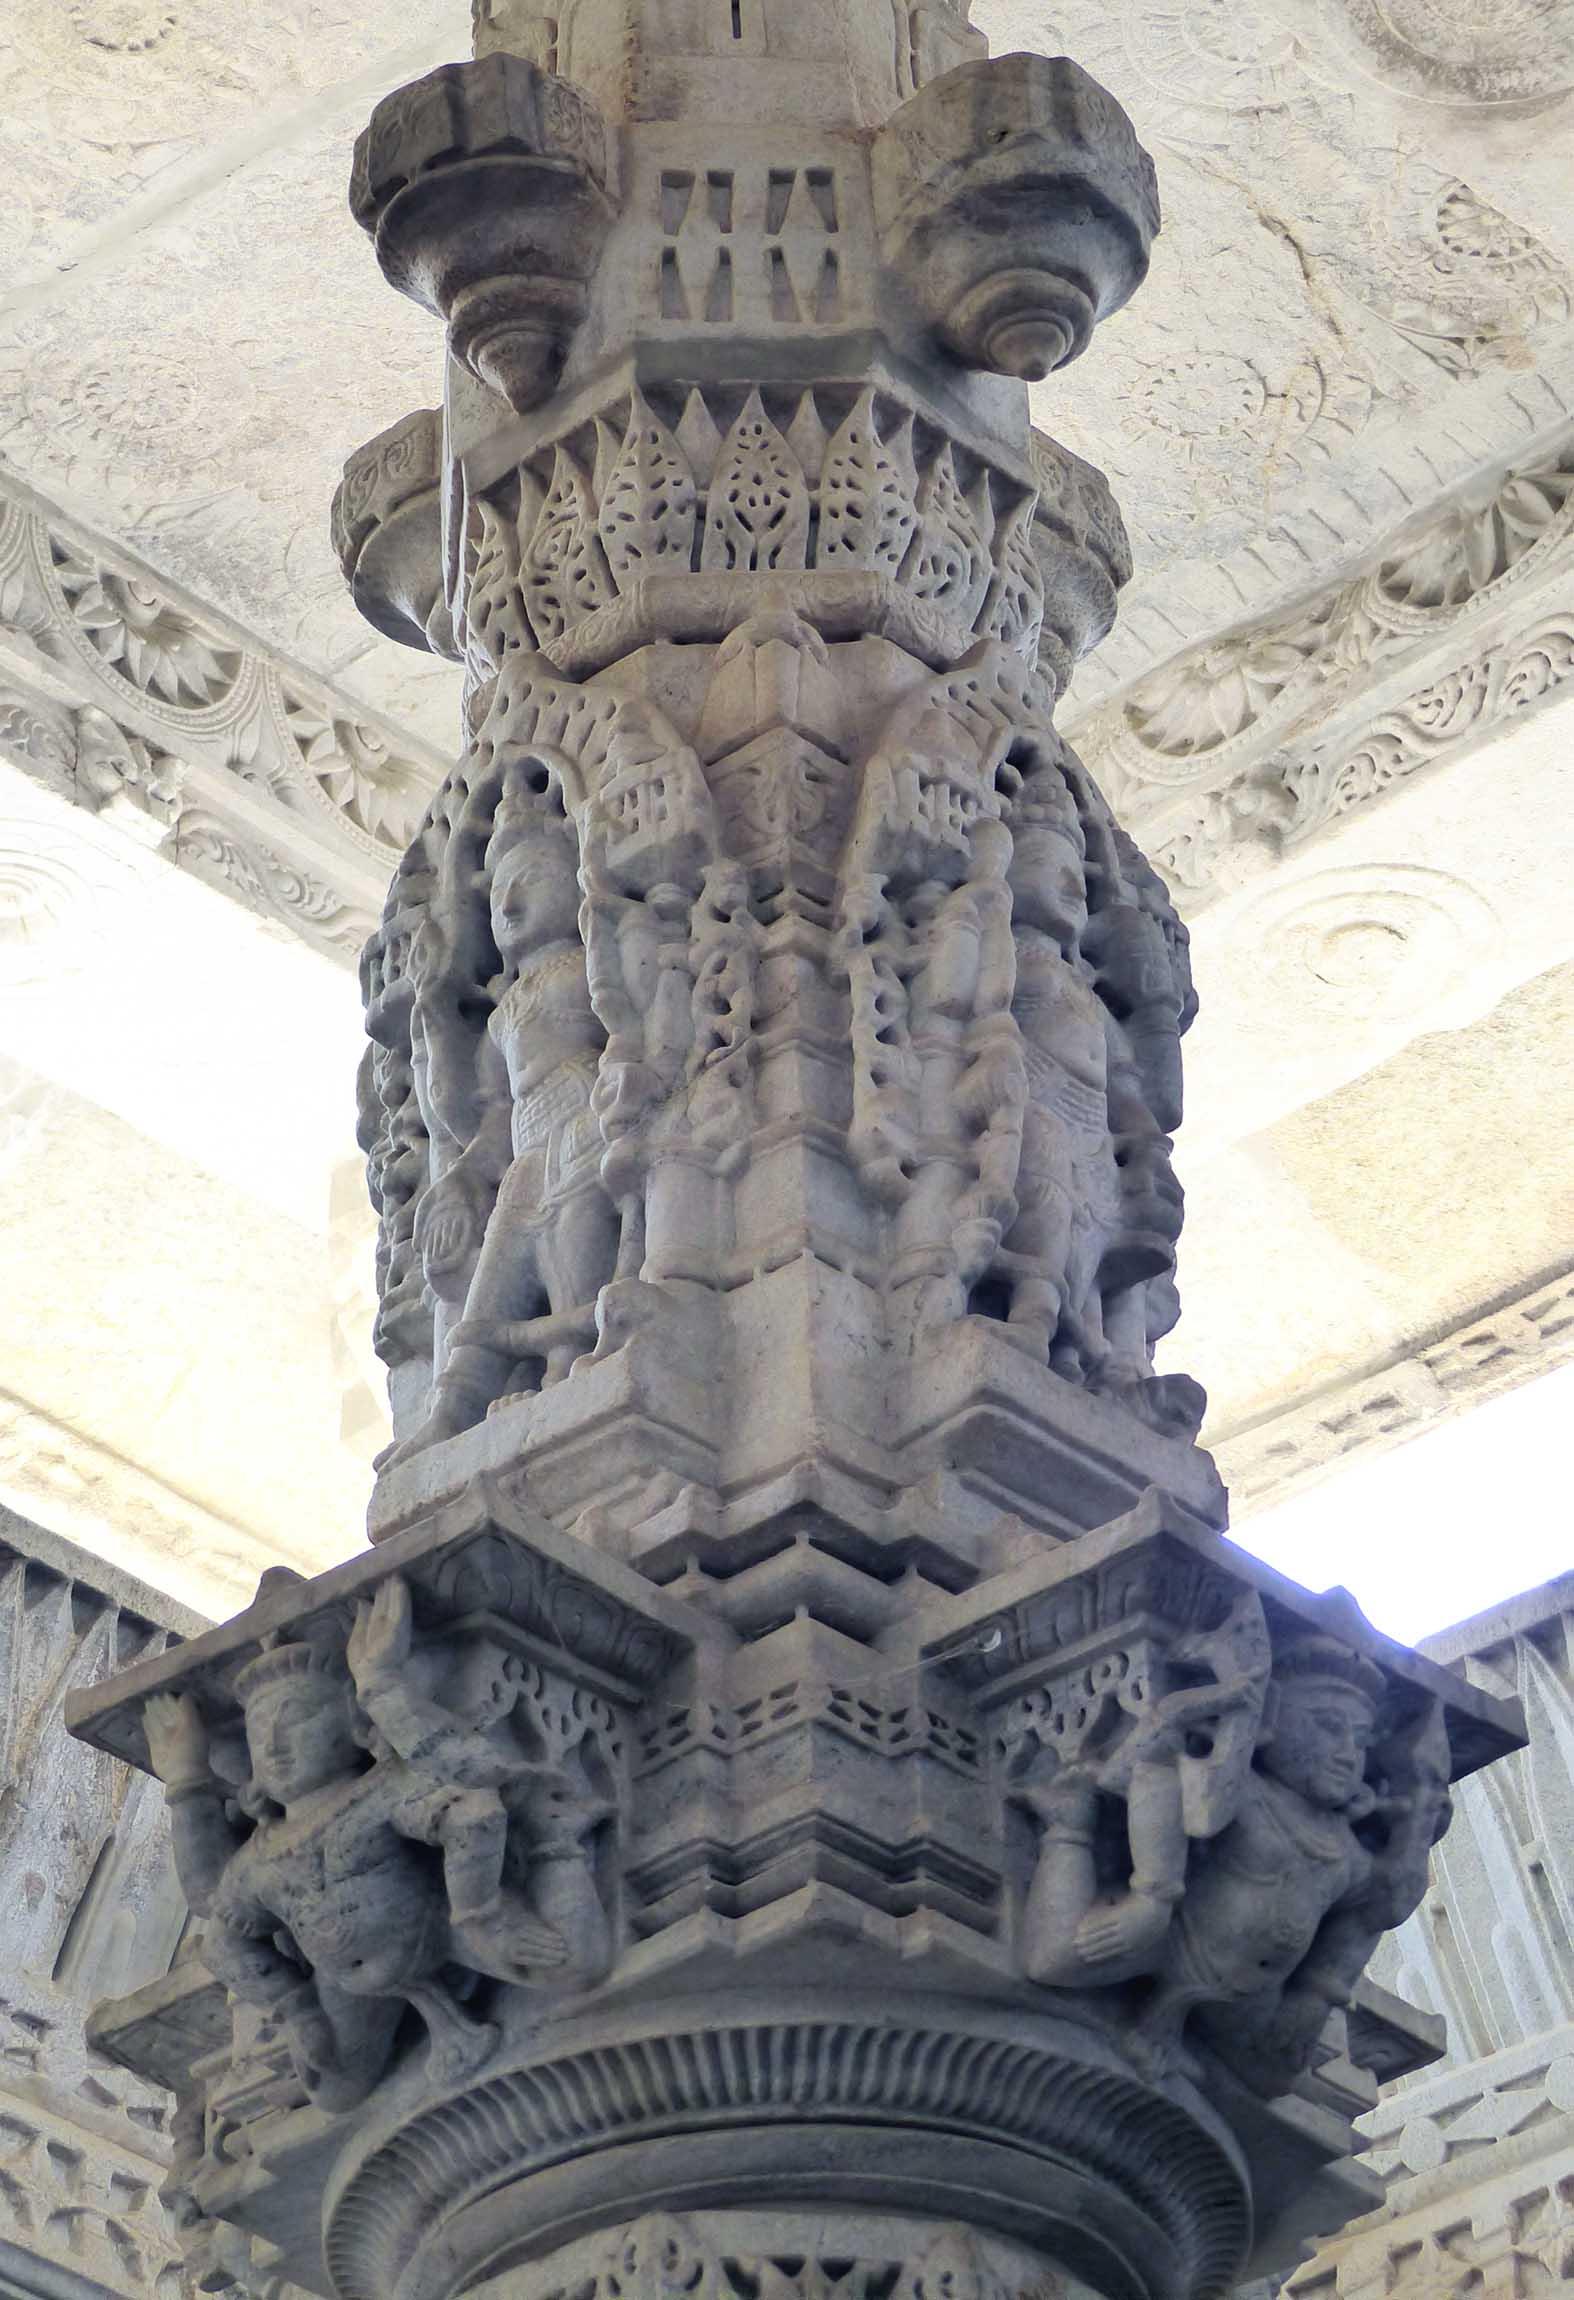 Ornate marble pillar